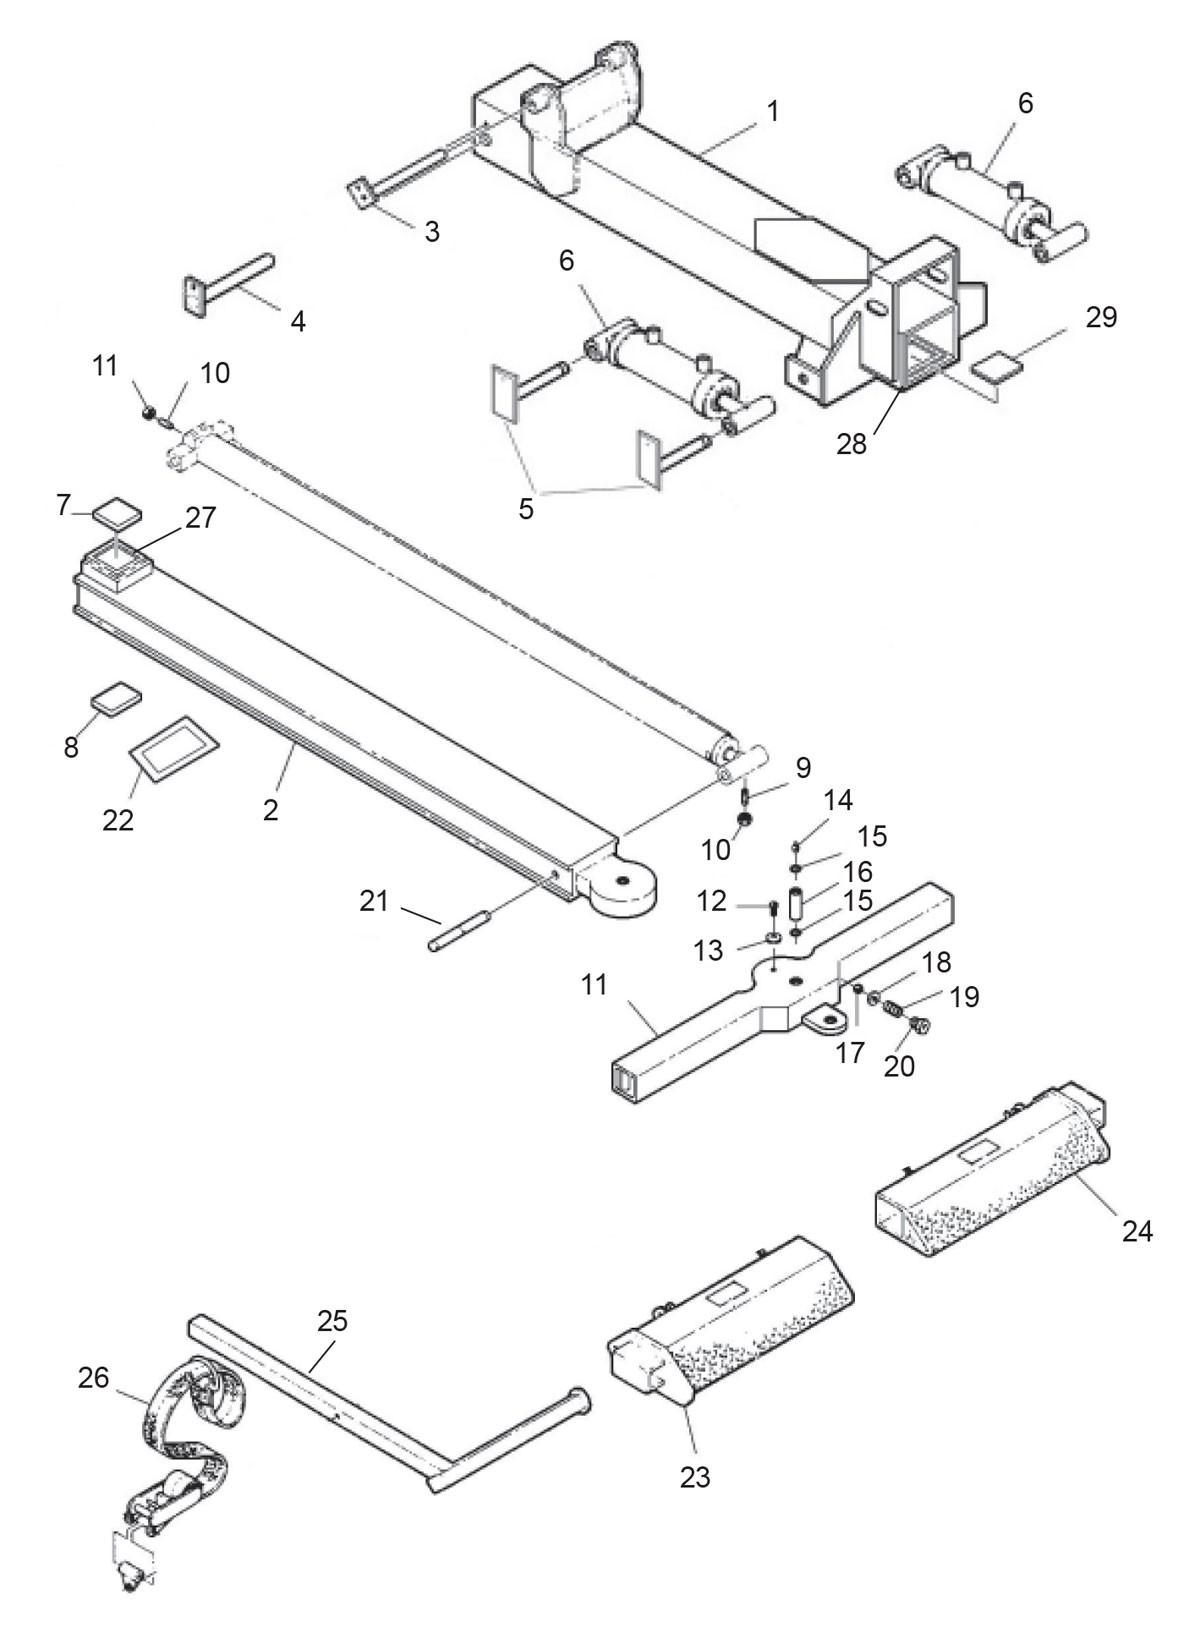 Car Wheel assembly Diagram Wheel Lift & Slide In Tire Restraint assembly Of Car Wheel assembly Diagram